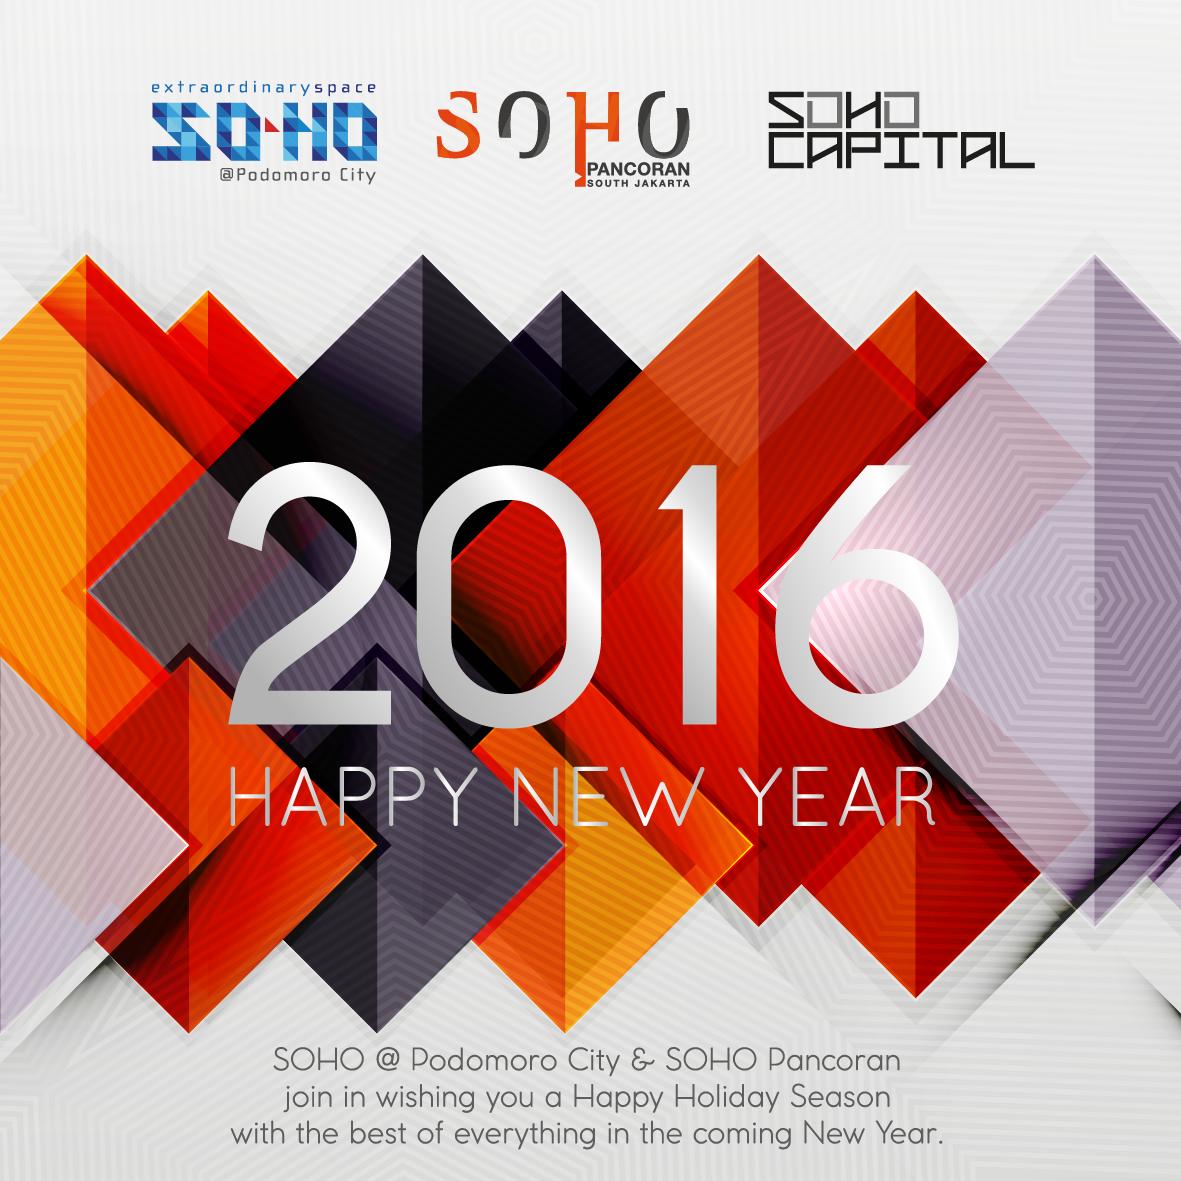 SOHO Newyear 2016 greetings (FIX)-02